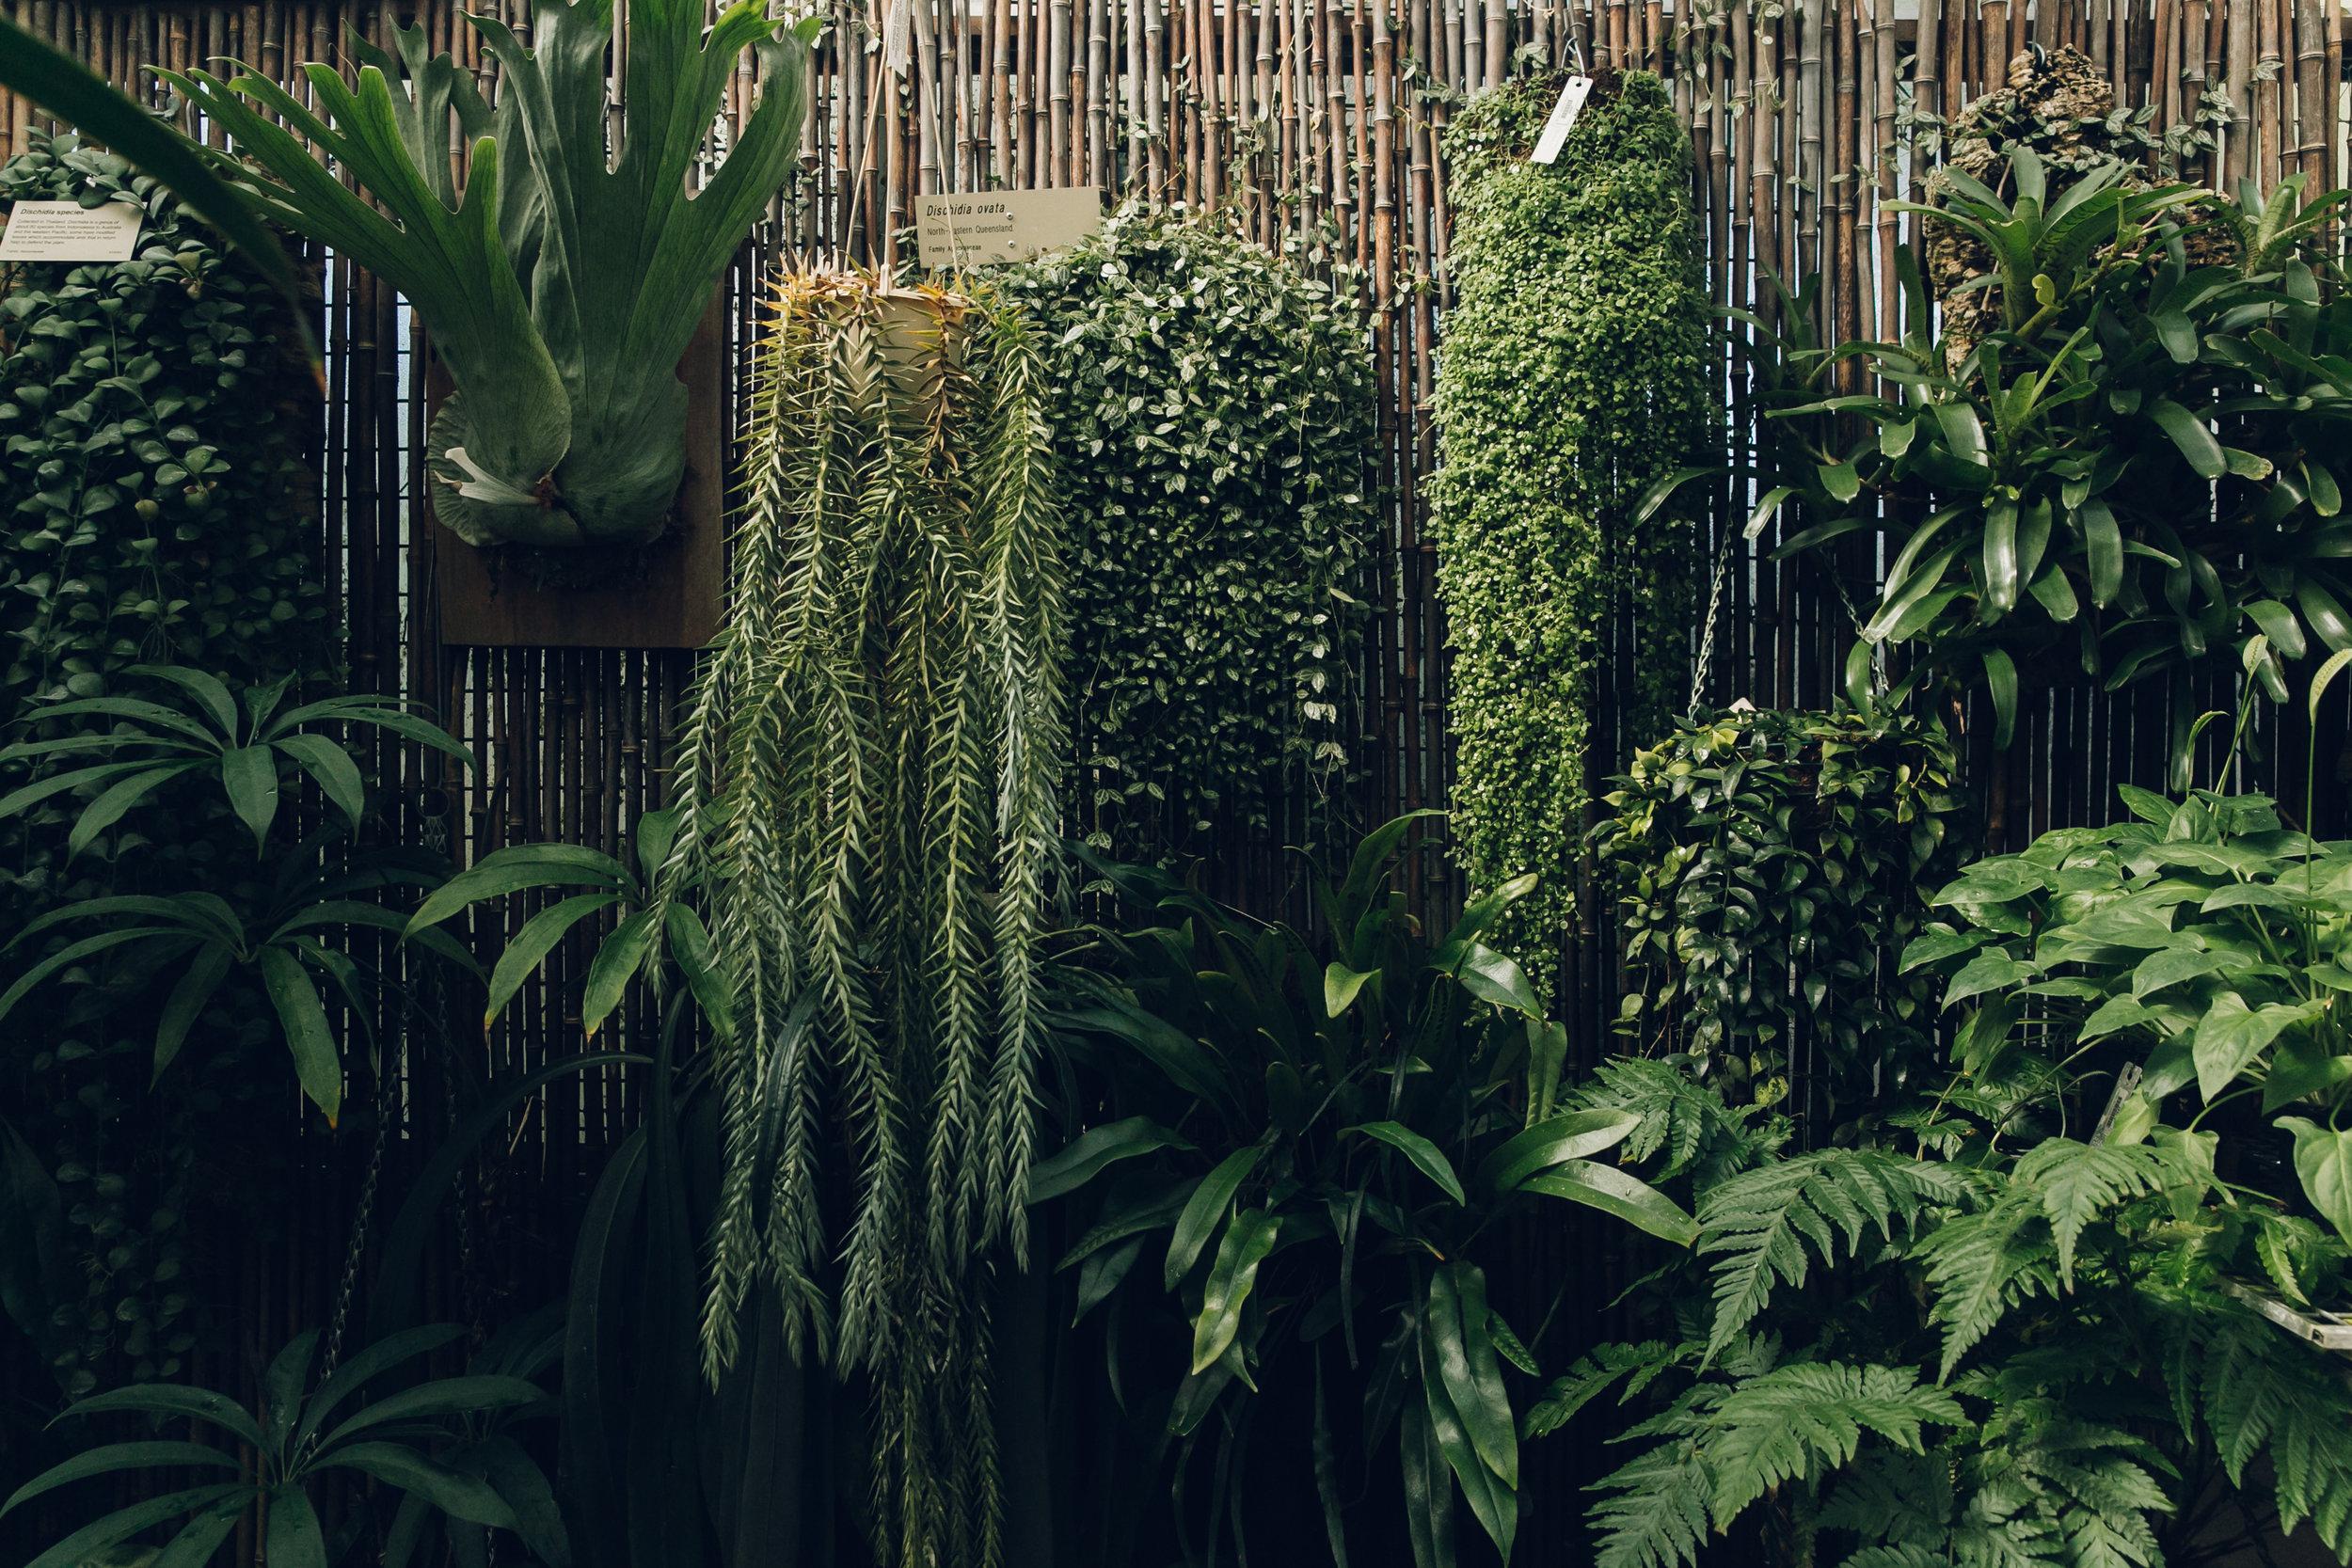 Latitude 23 Glasshouse in the Royal Botanic Gardens, Sydney (Australia) by Haarkon.